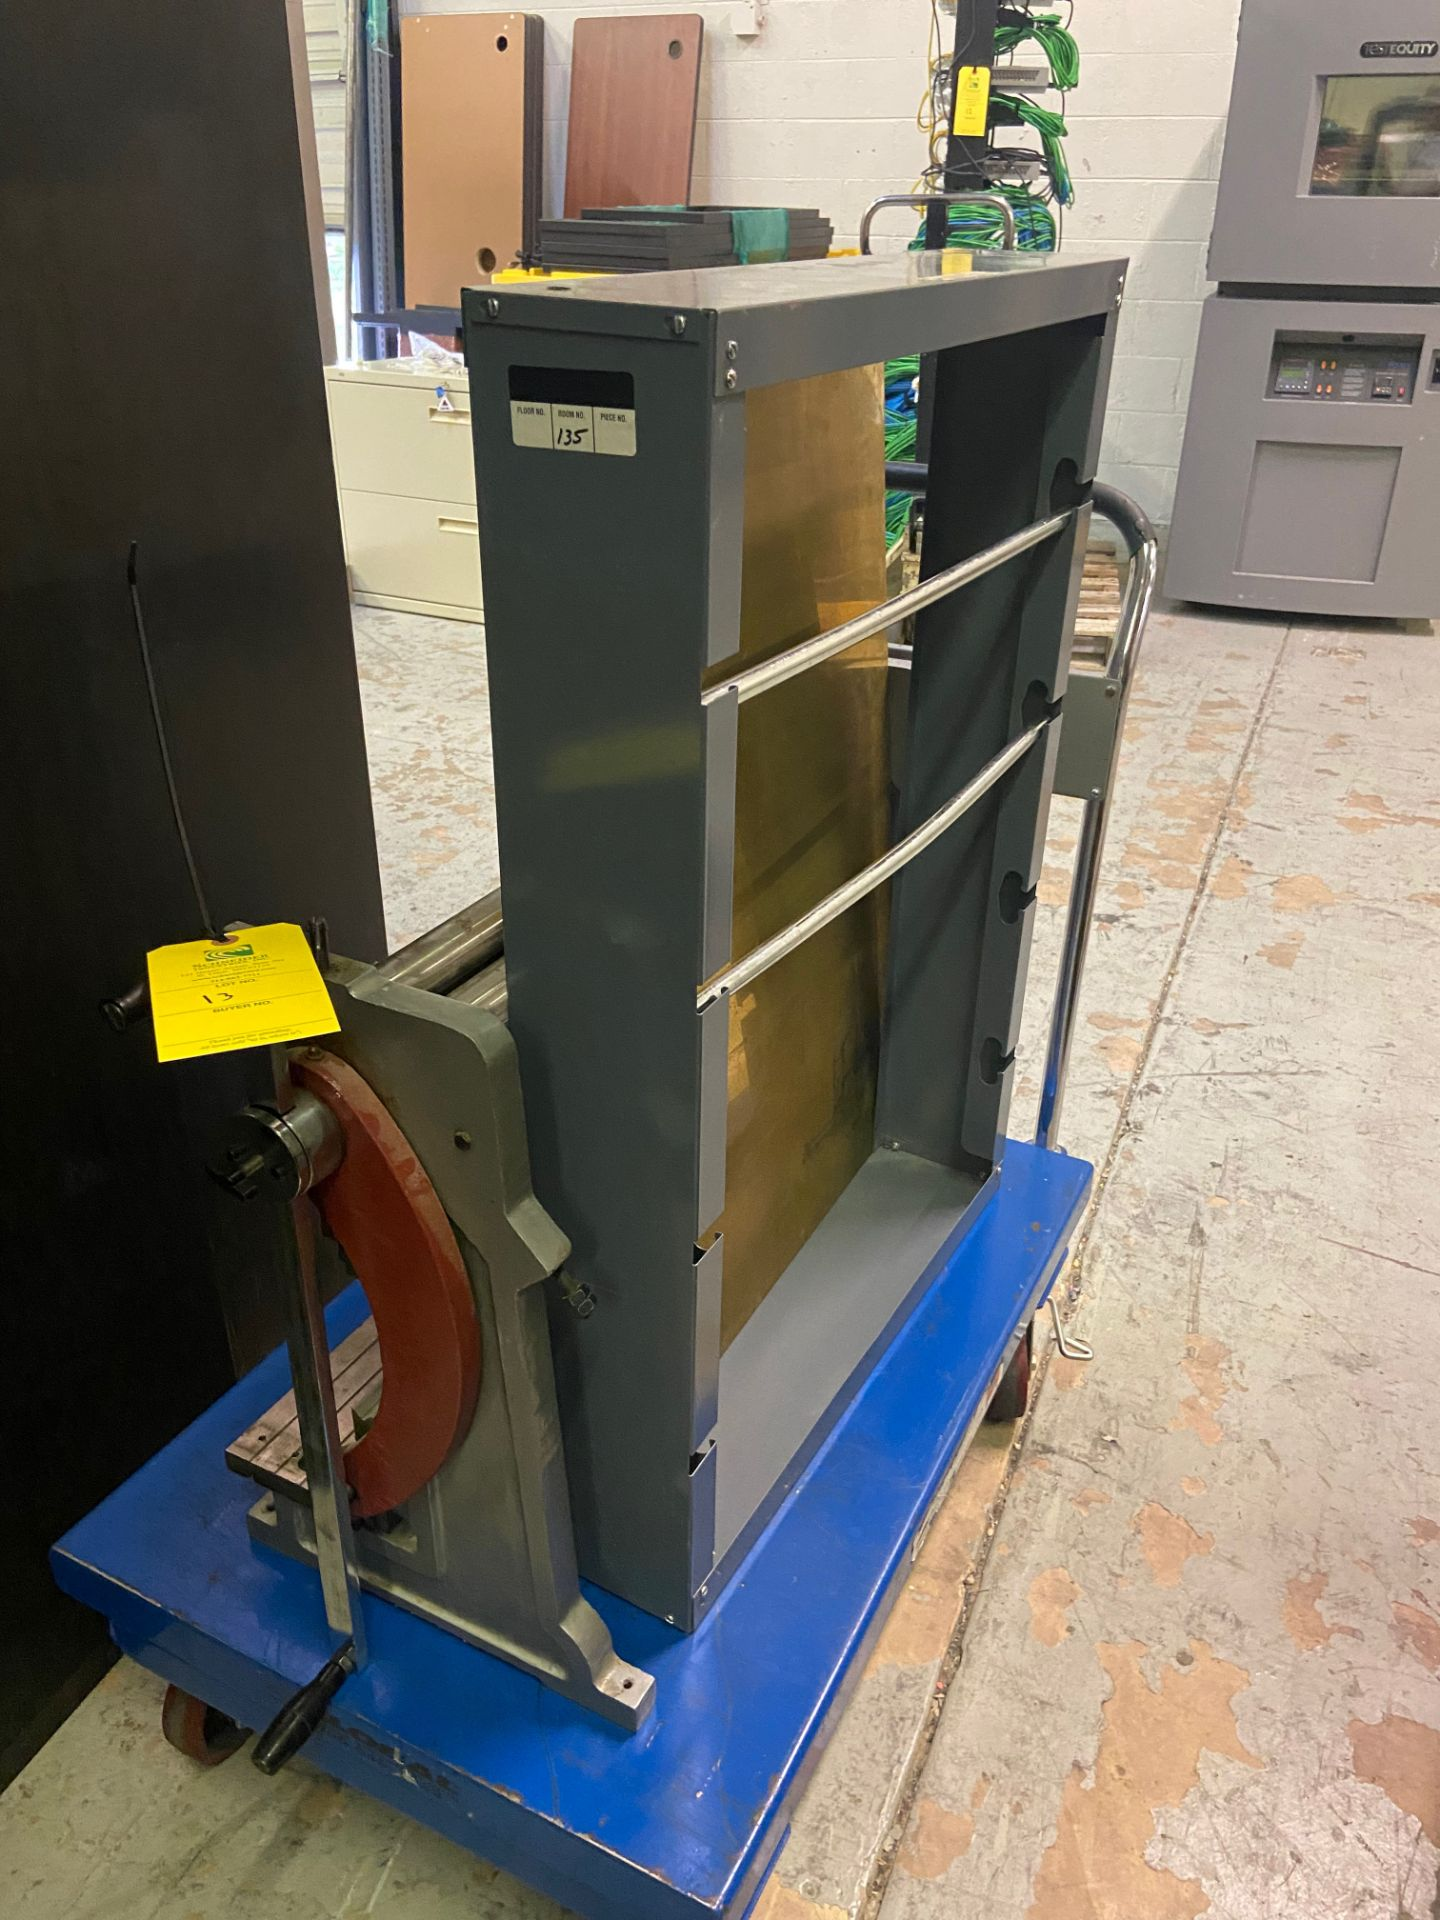 Durham Sheet Metal Brake/Bender, Model# WSR-4, Loading/Removal Fee: $20 - Image 3 of 5